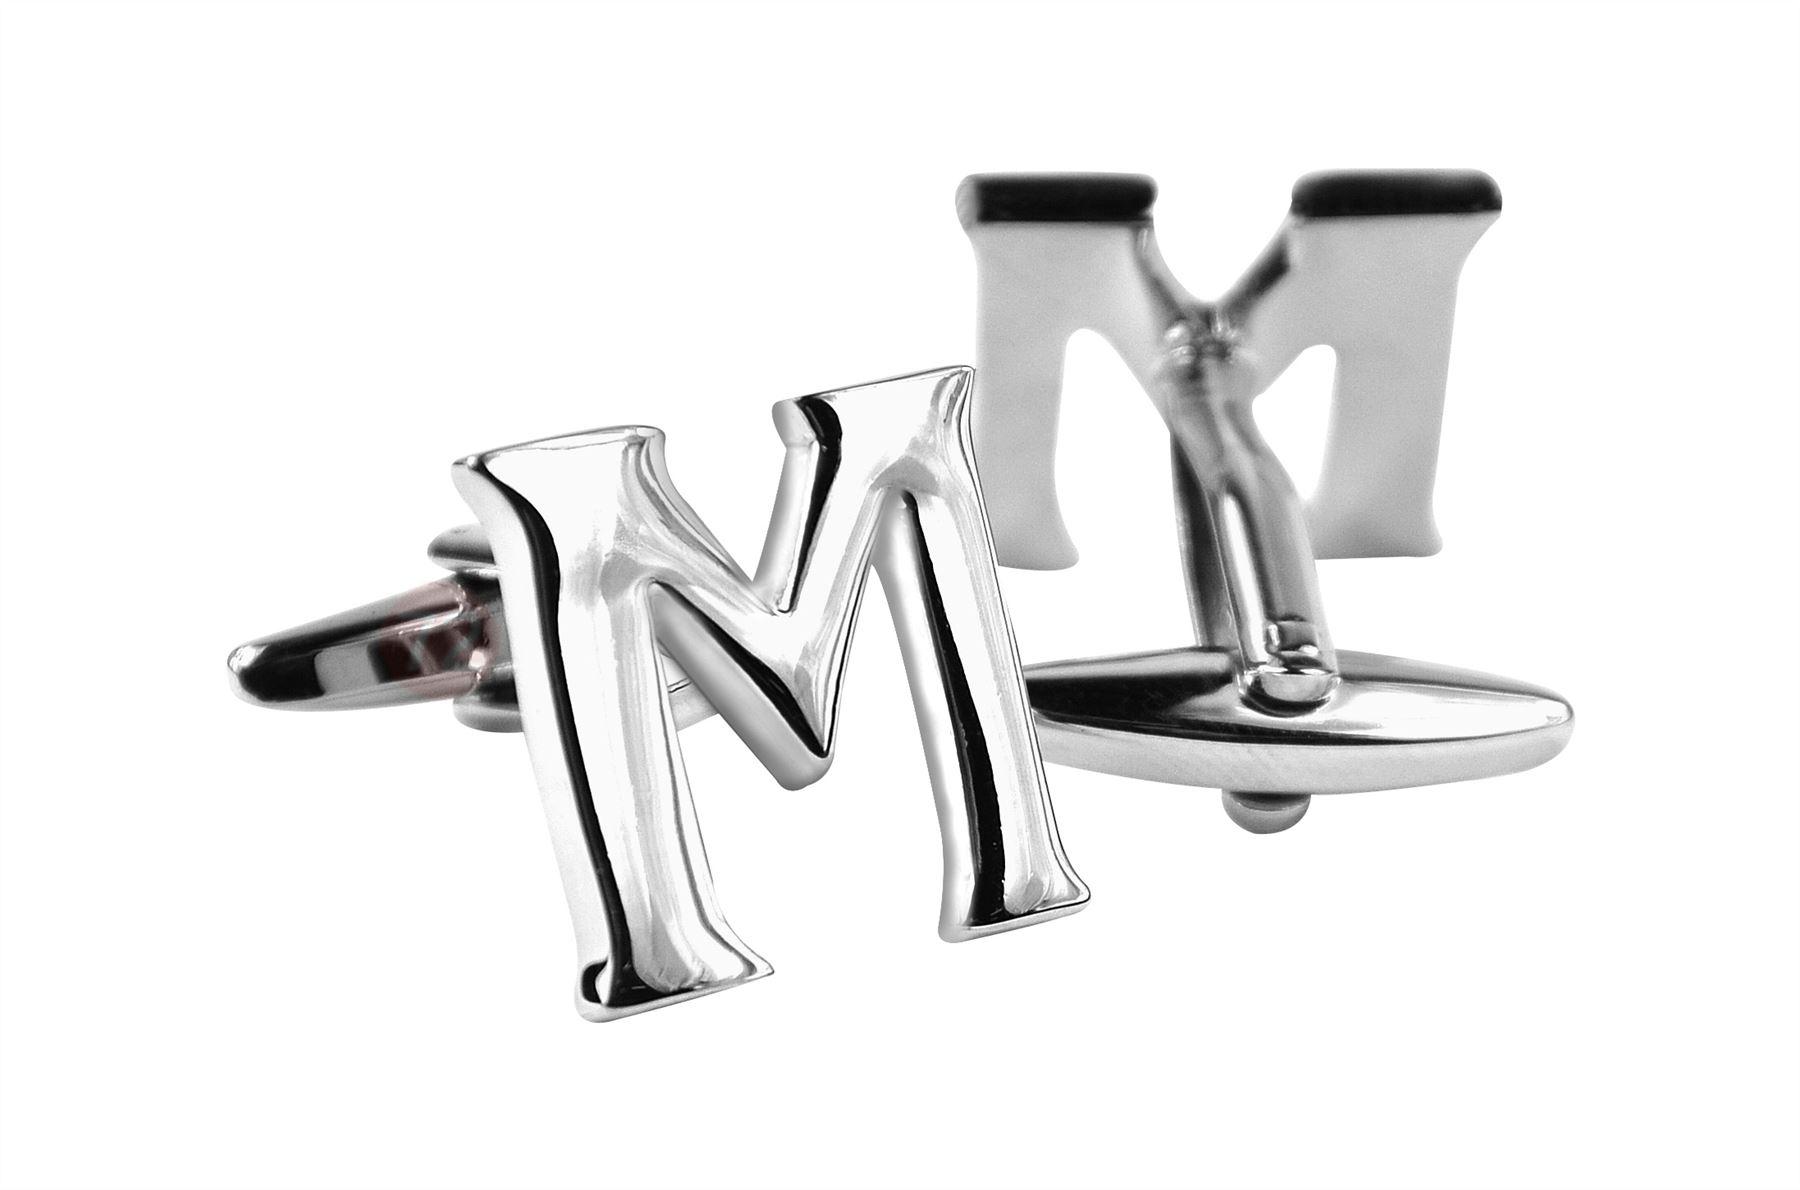 Mens Initial Cufflinks  Alphabet Cufflinks Personalized Cufflinks Sterling Silver Vintage Polished Metal Cufflinks - Silver One Size